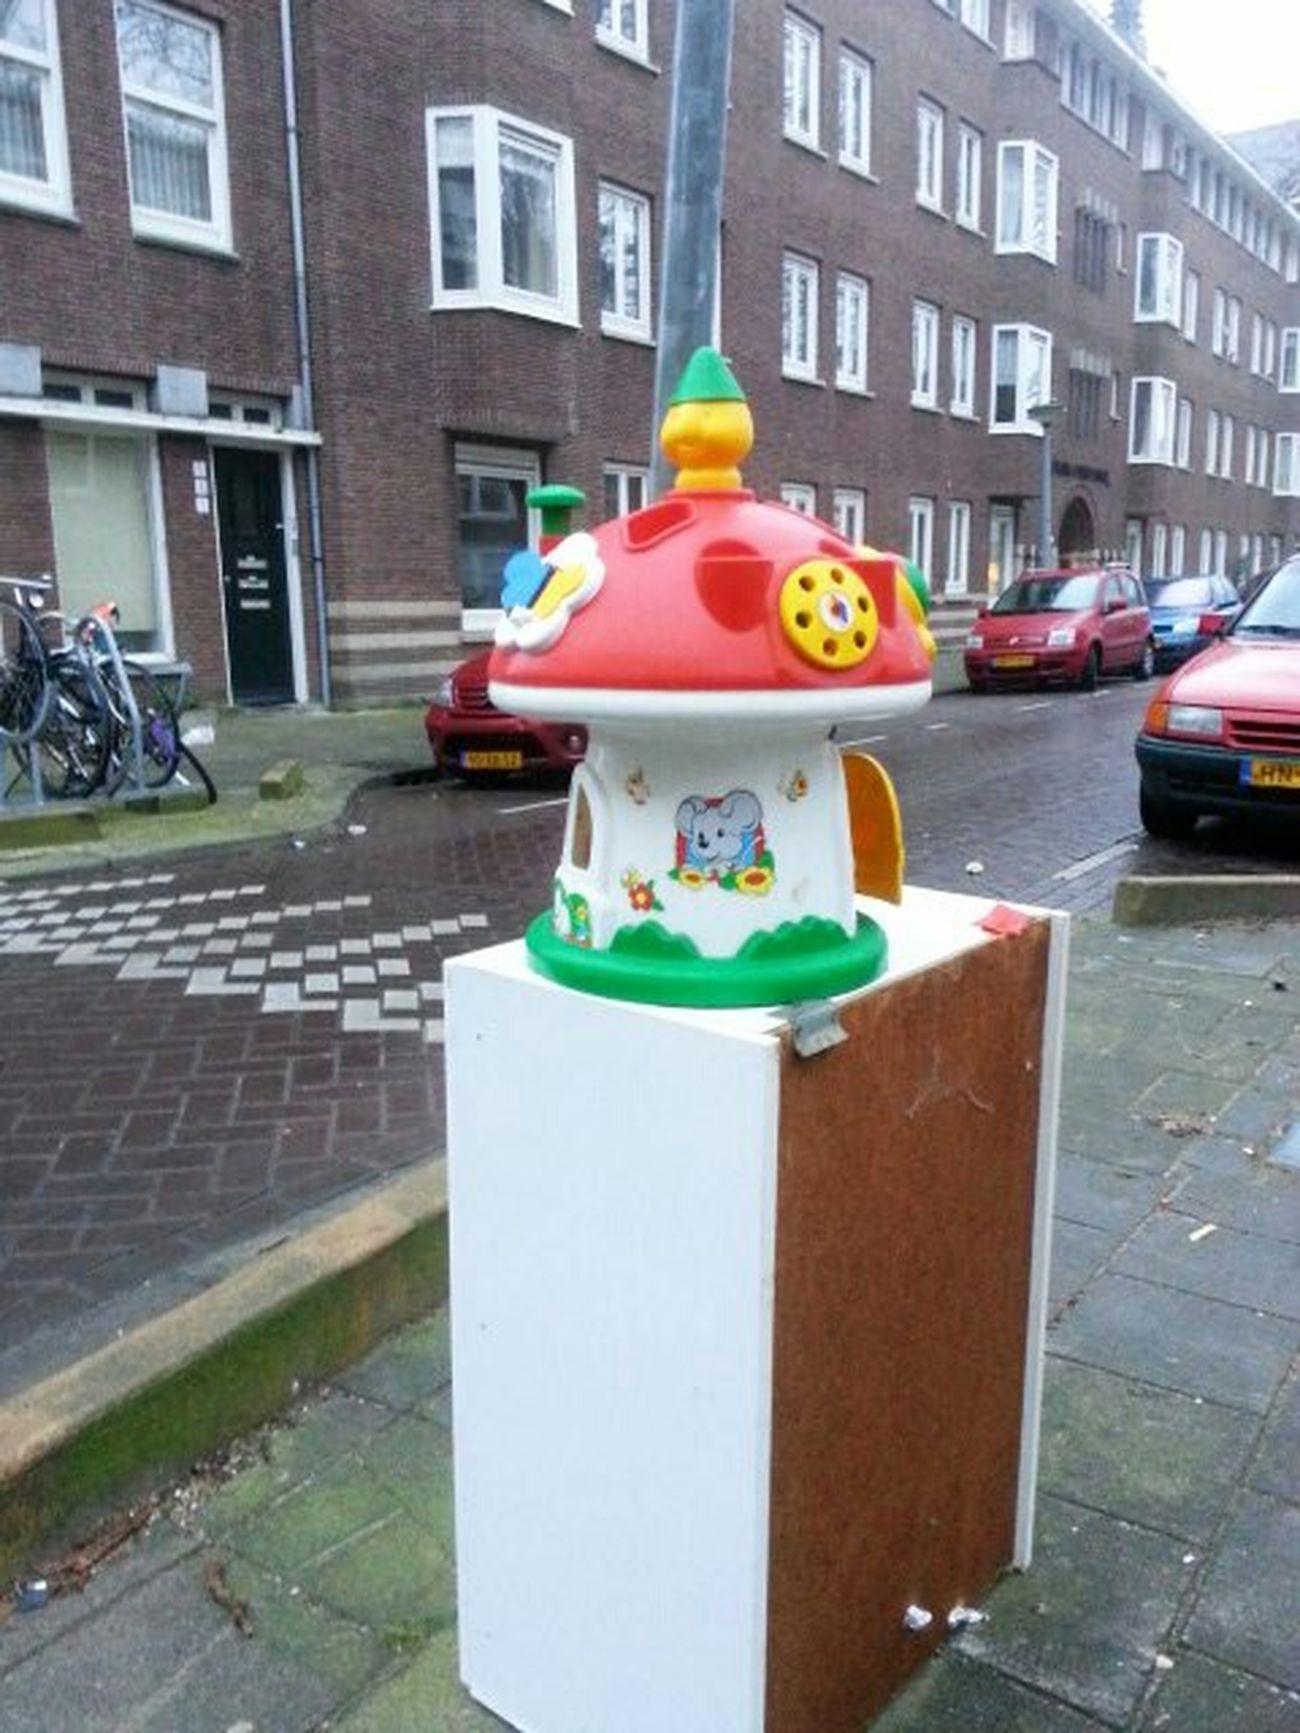 Paddo's in Amsterdam keep popping up. Fotofantast Mushroom City Streetphotography Amsterdam Mushroom Giant Buttplug Reinier Claeszenplein Toy Toy Photography Photography